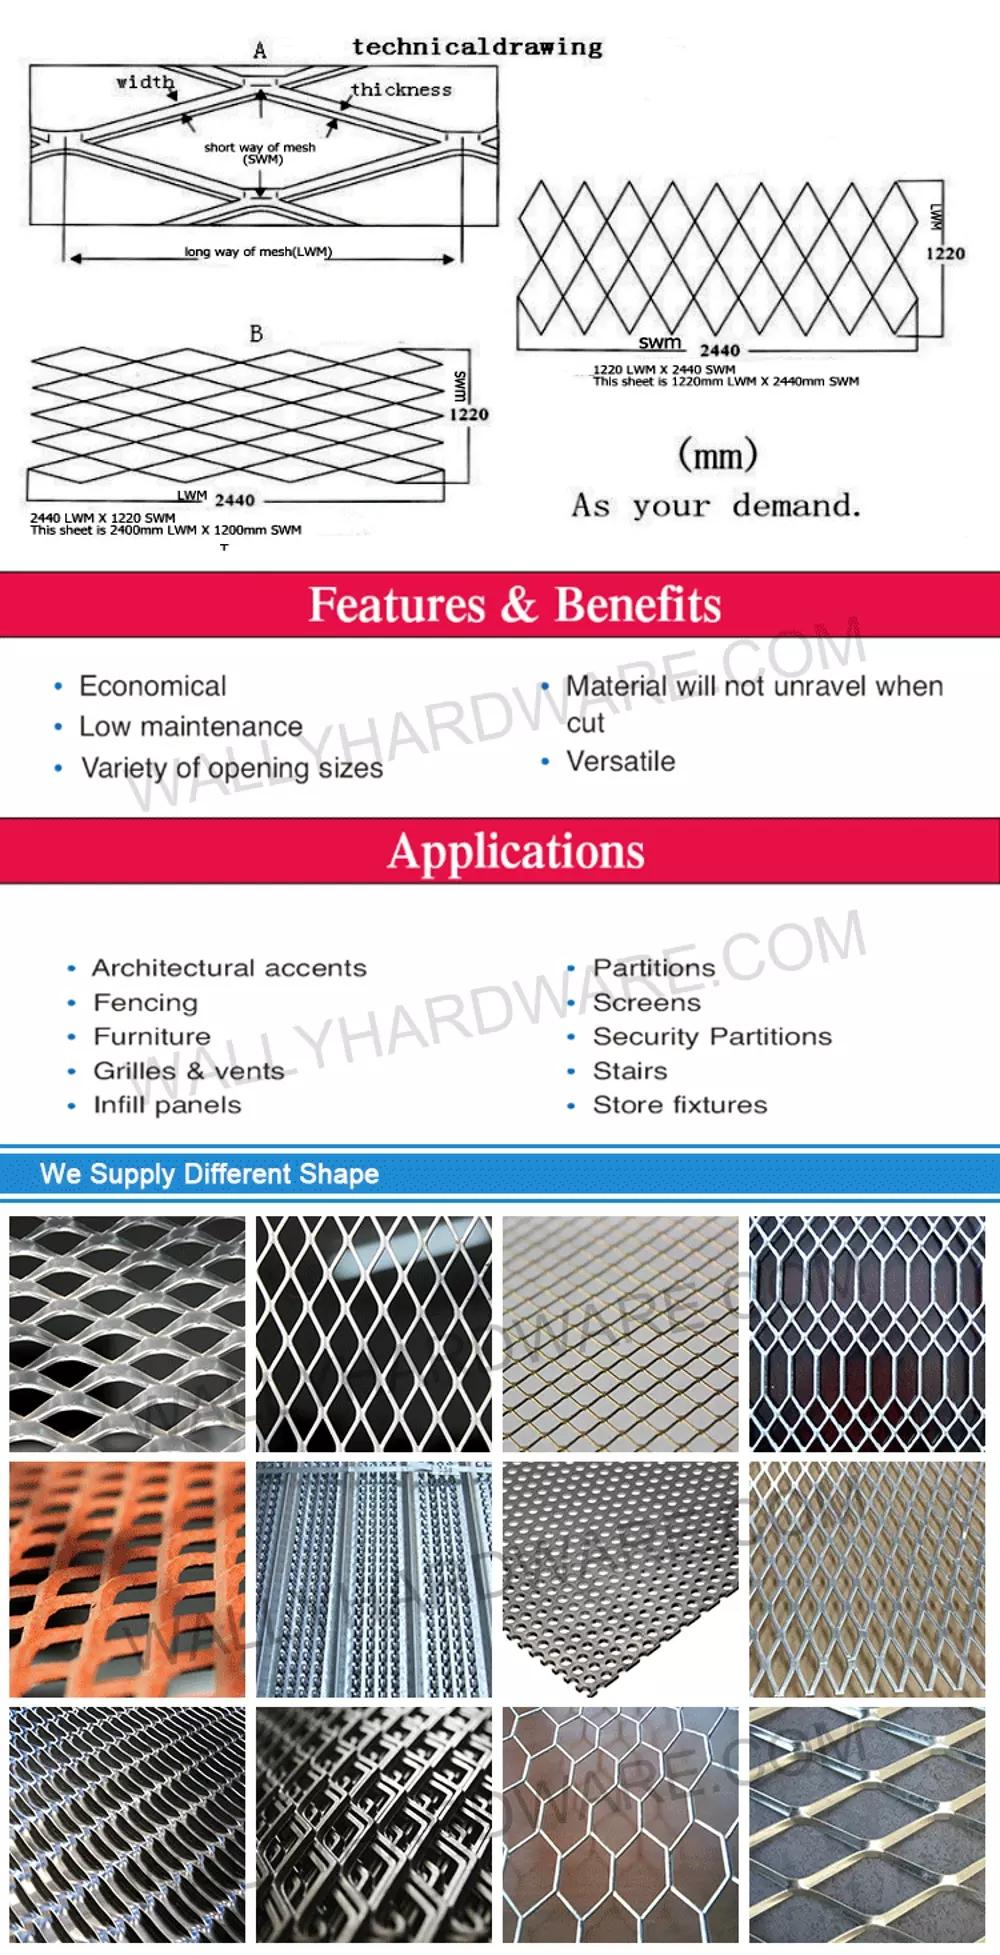 Fabrika Toptan Yüksek Kalite Genişletilmiş dekoratif alüminyum metal örgü